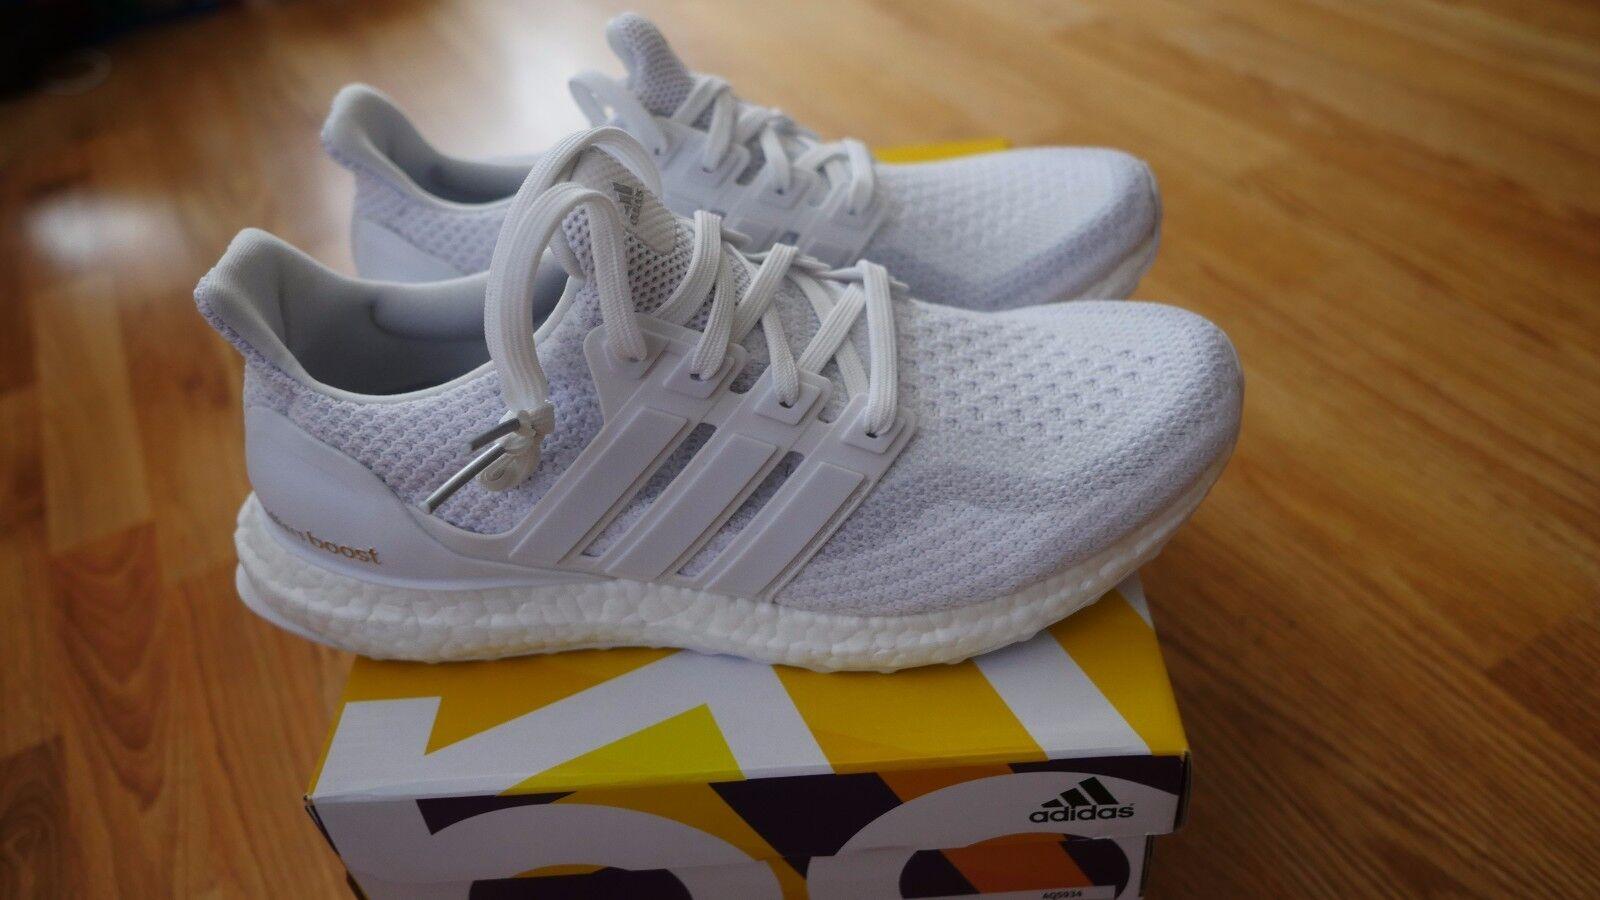 Adidas caged ultra boost 2.0 triple white woman size uk7.5 us9 eu41.5